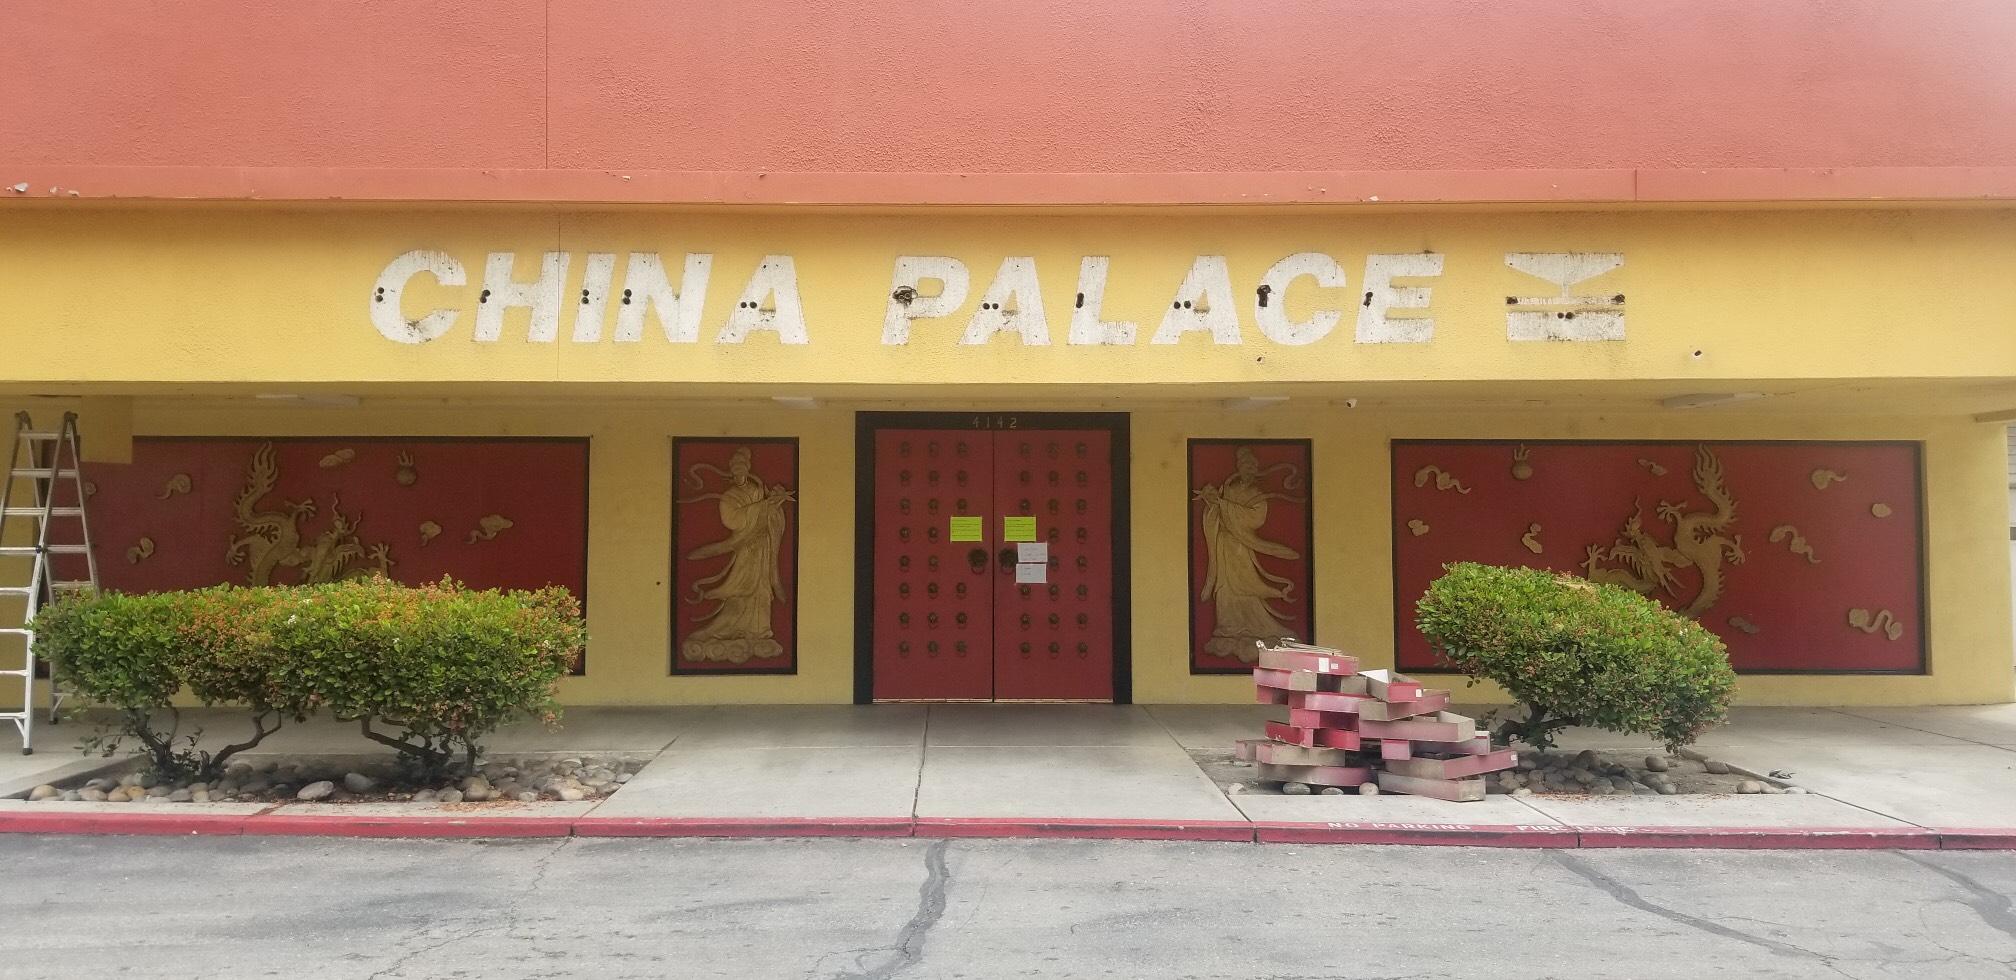 China Palace 1_1556576098571.jpg.jpg